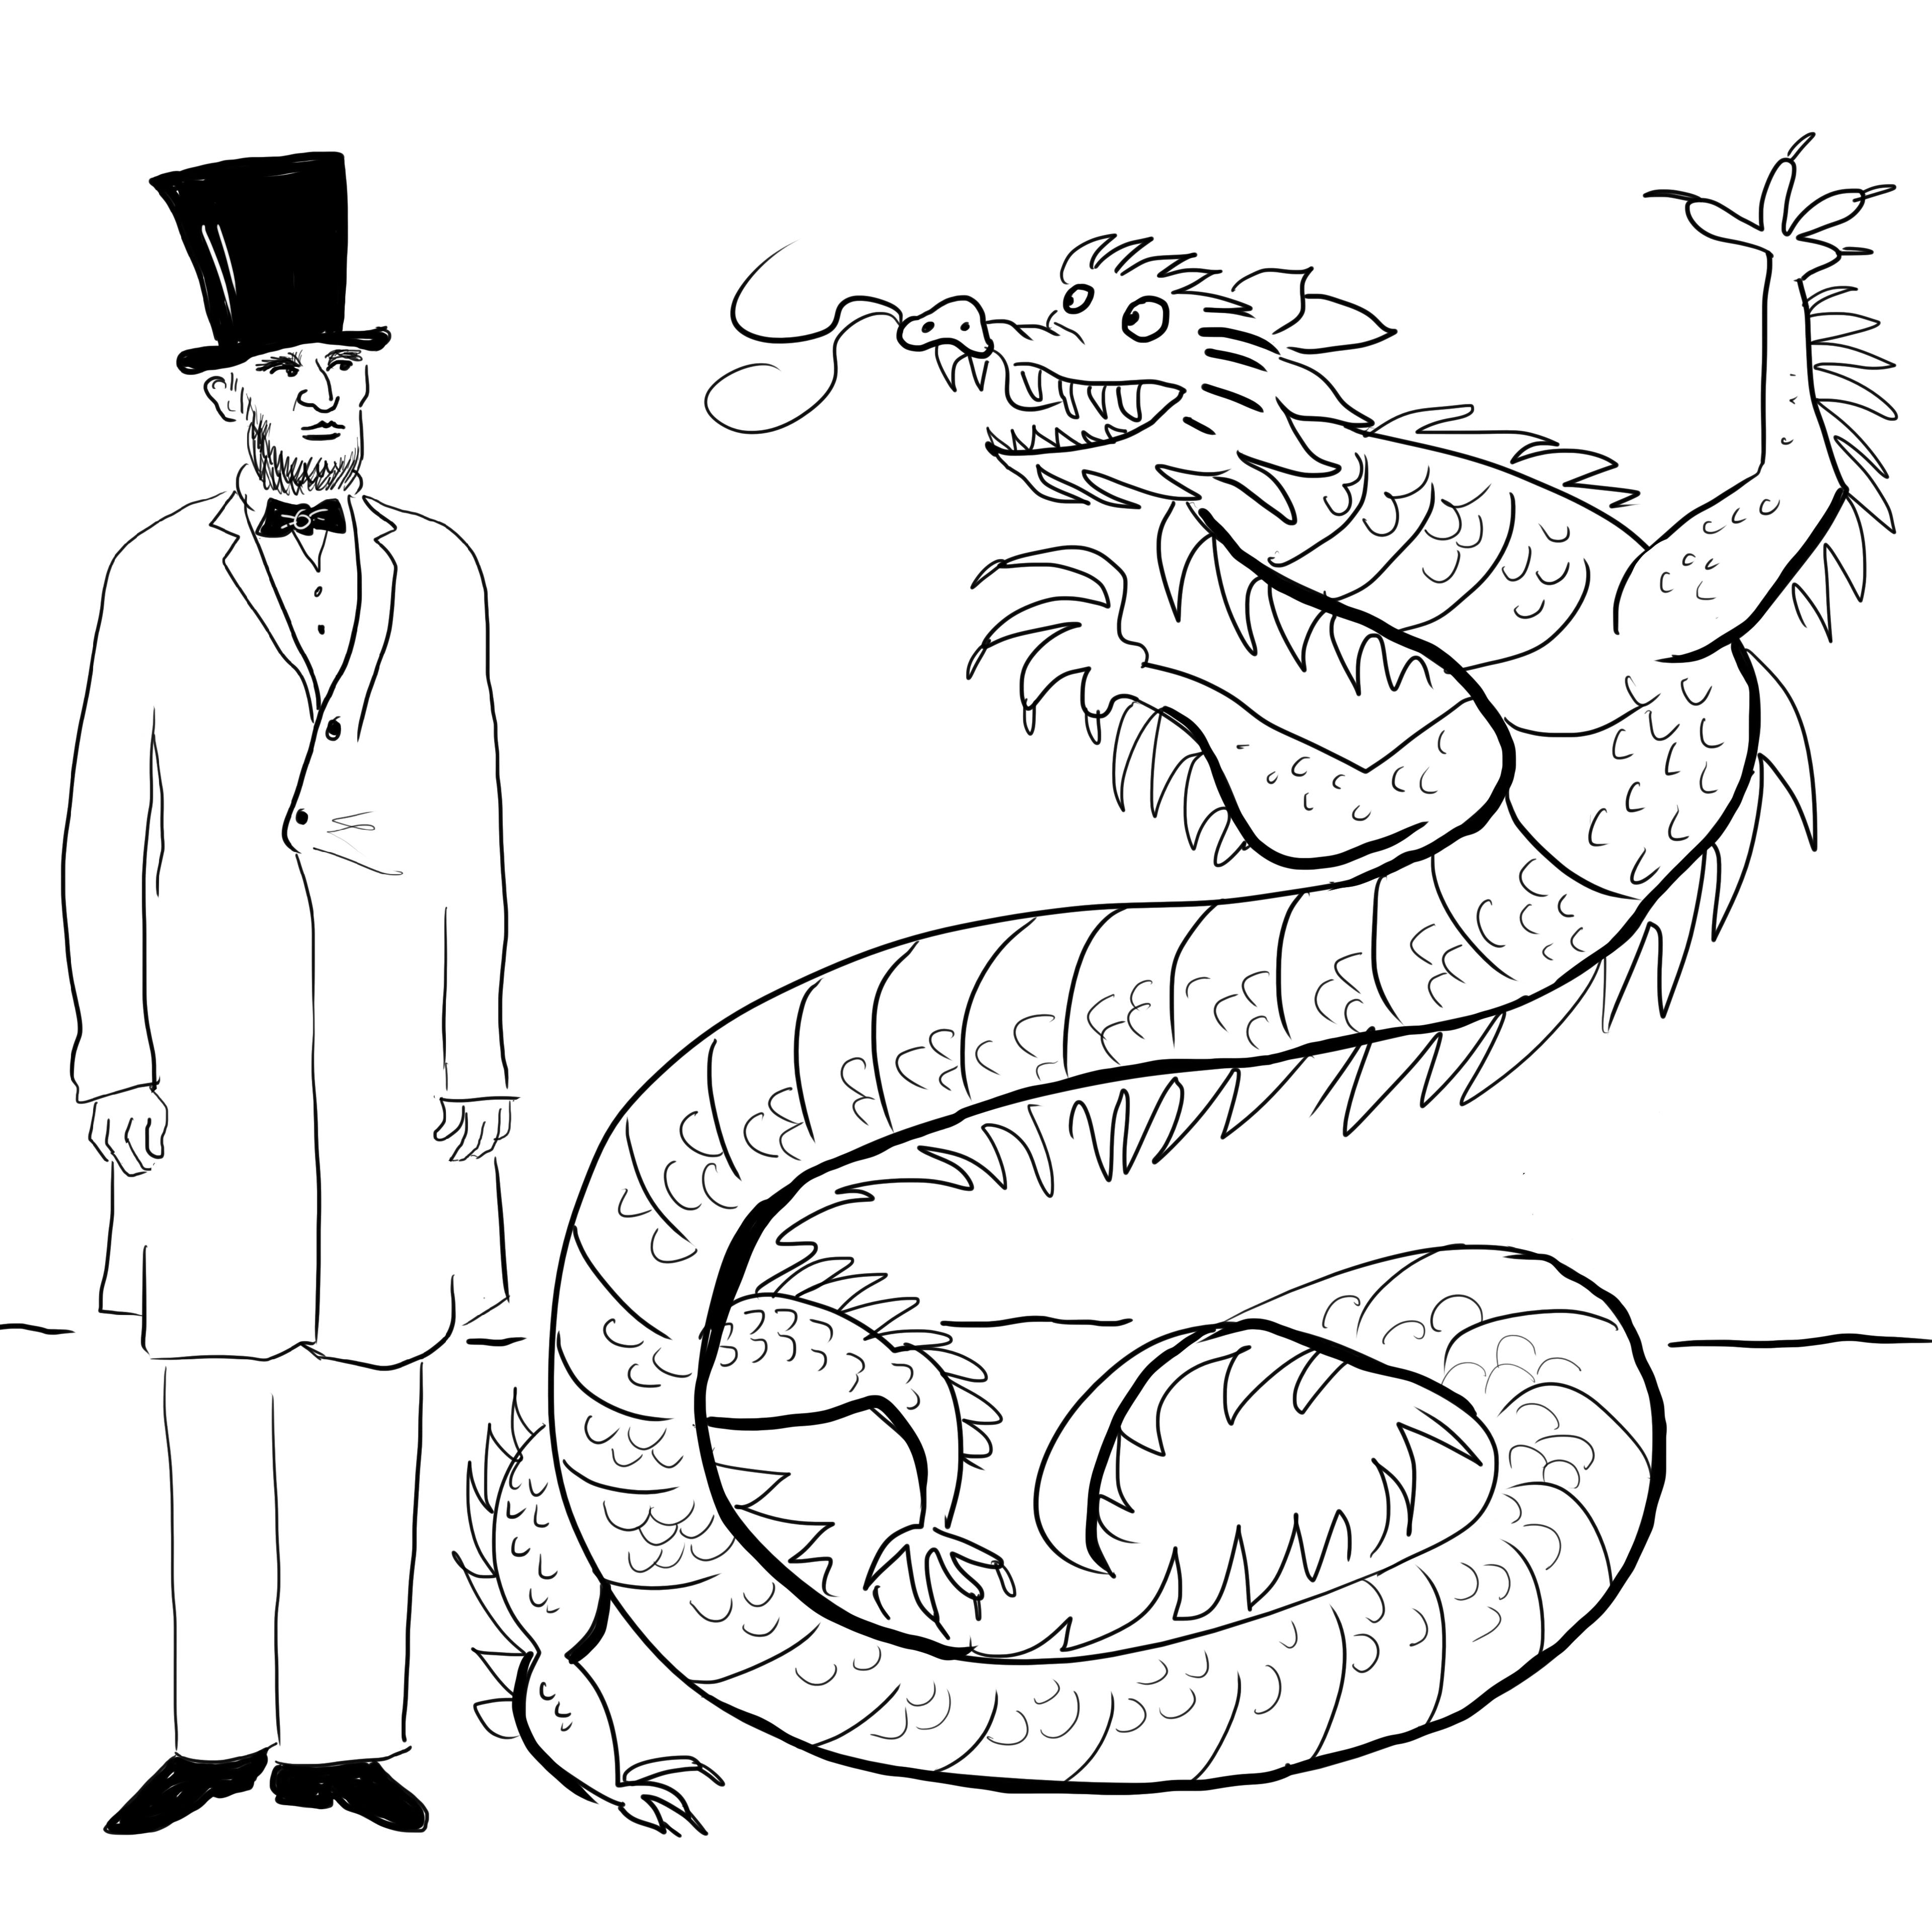 Abe's a Dragon, not a Snake